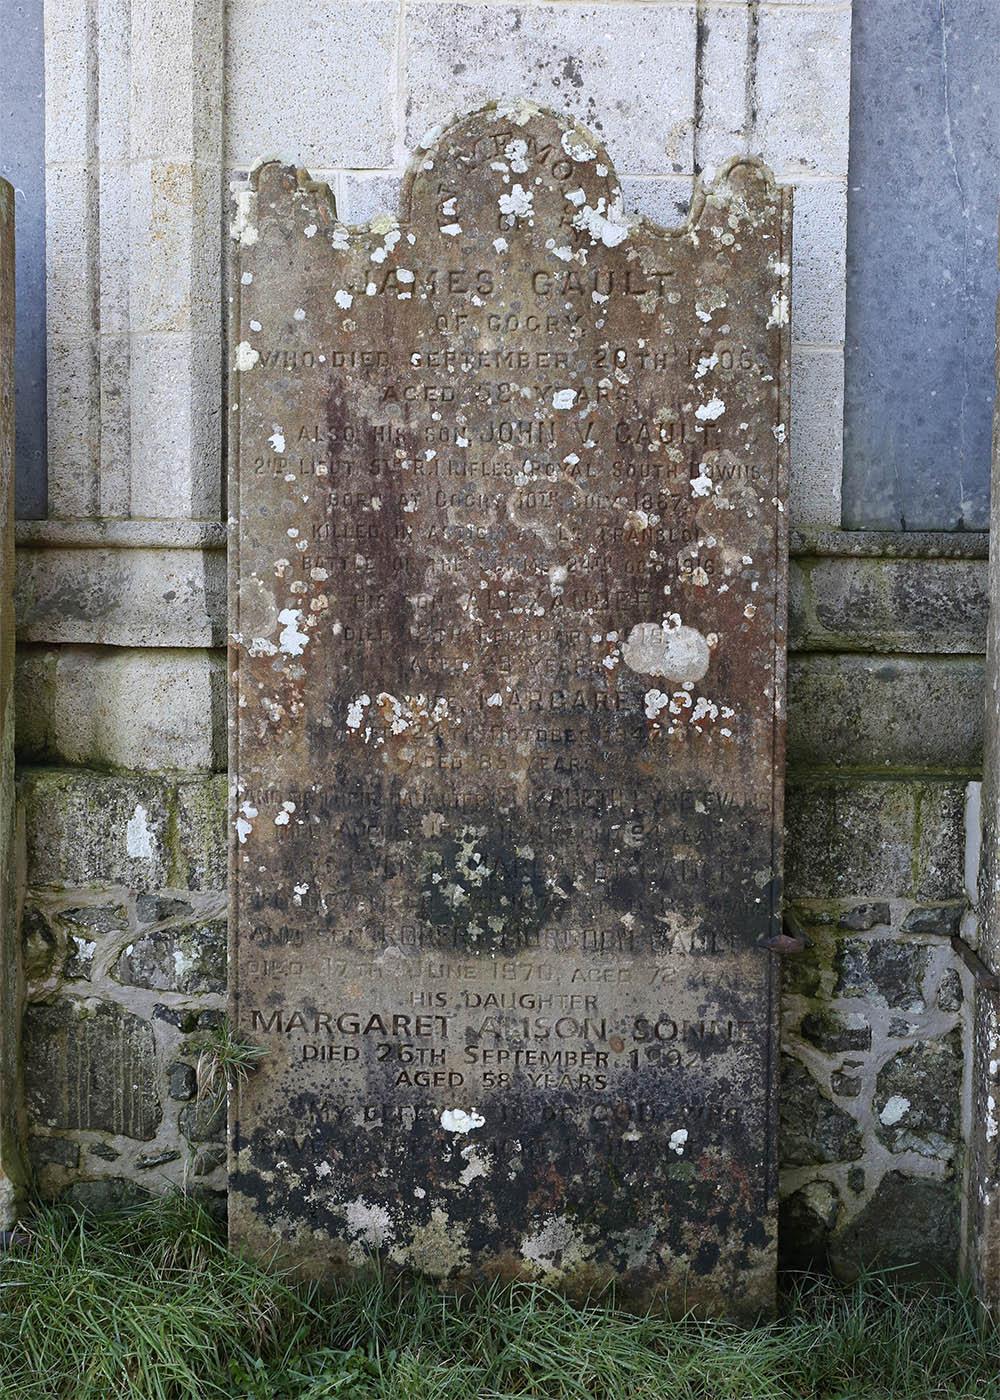 Gault family headstone in Kilbride New Cemetery